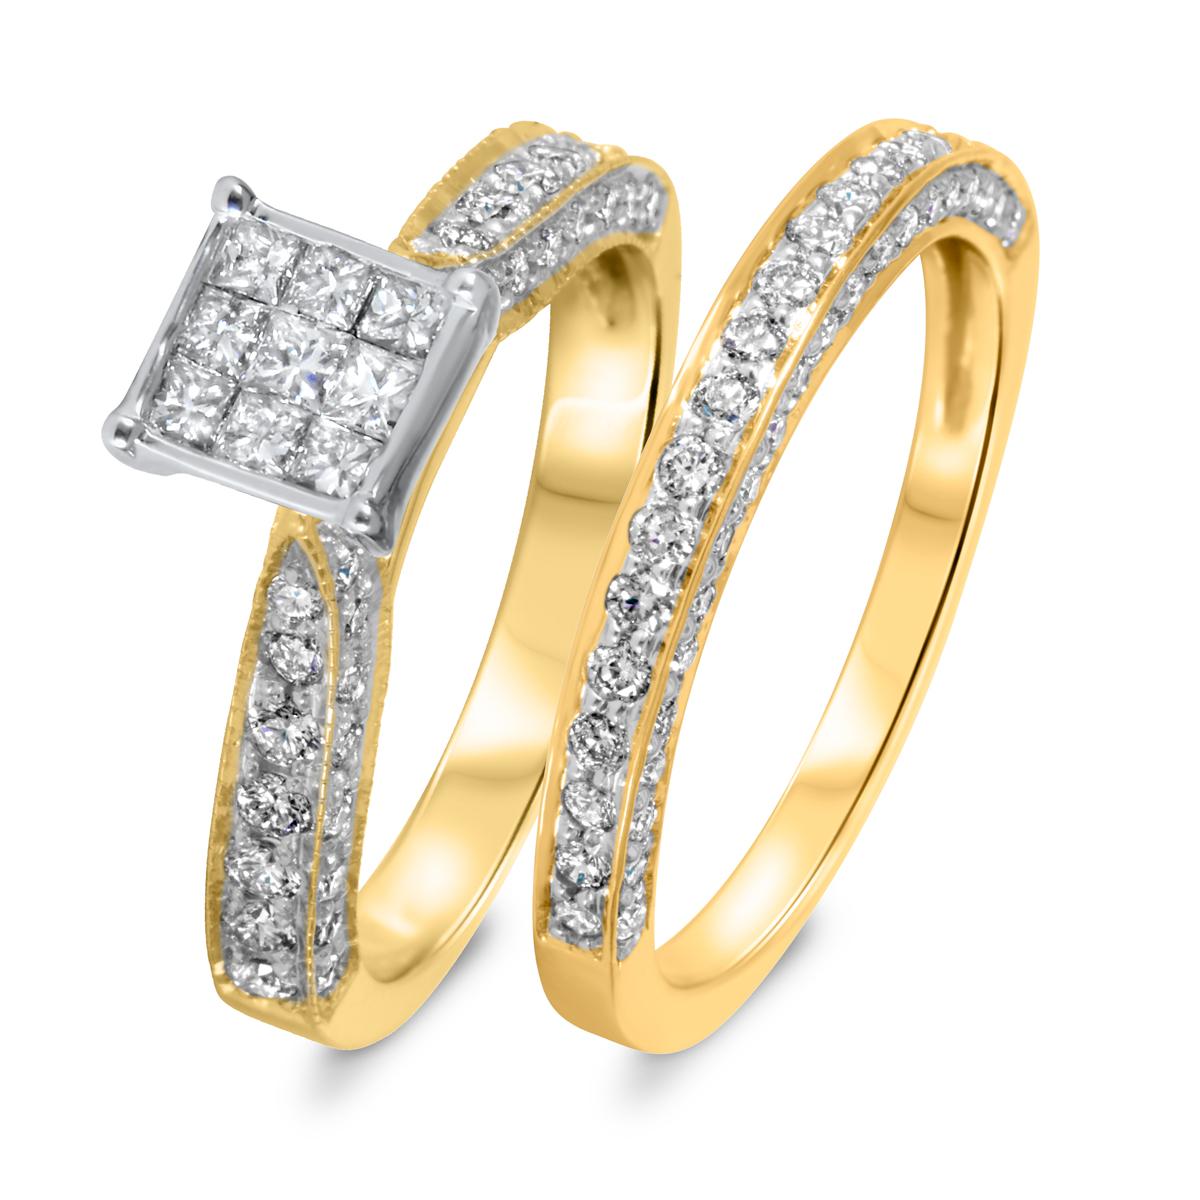 1 1/5 CT. T.W. Diamond Women's Bridal Wedding Ring Set 10K Yellow Gold